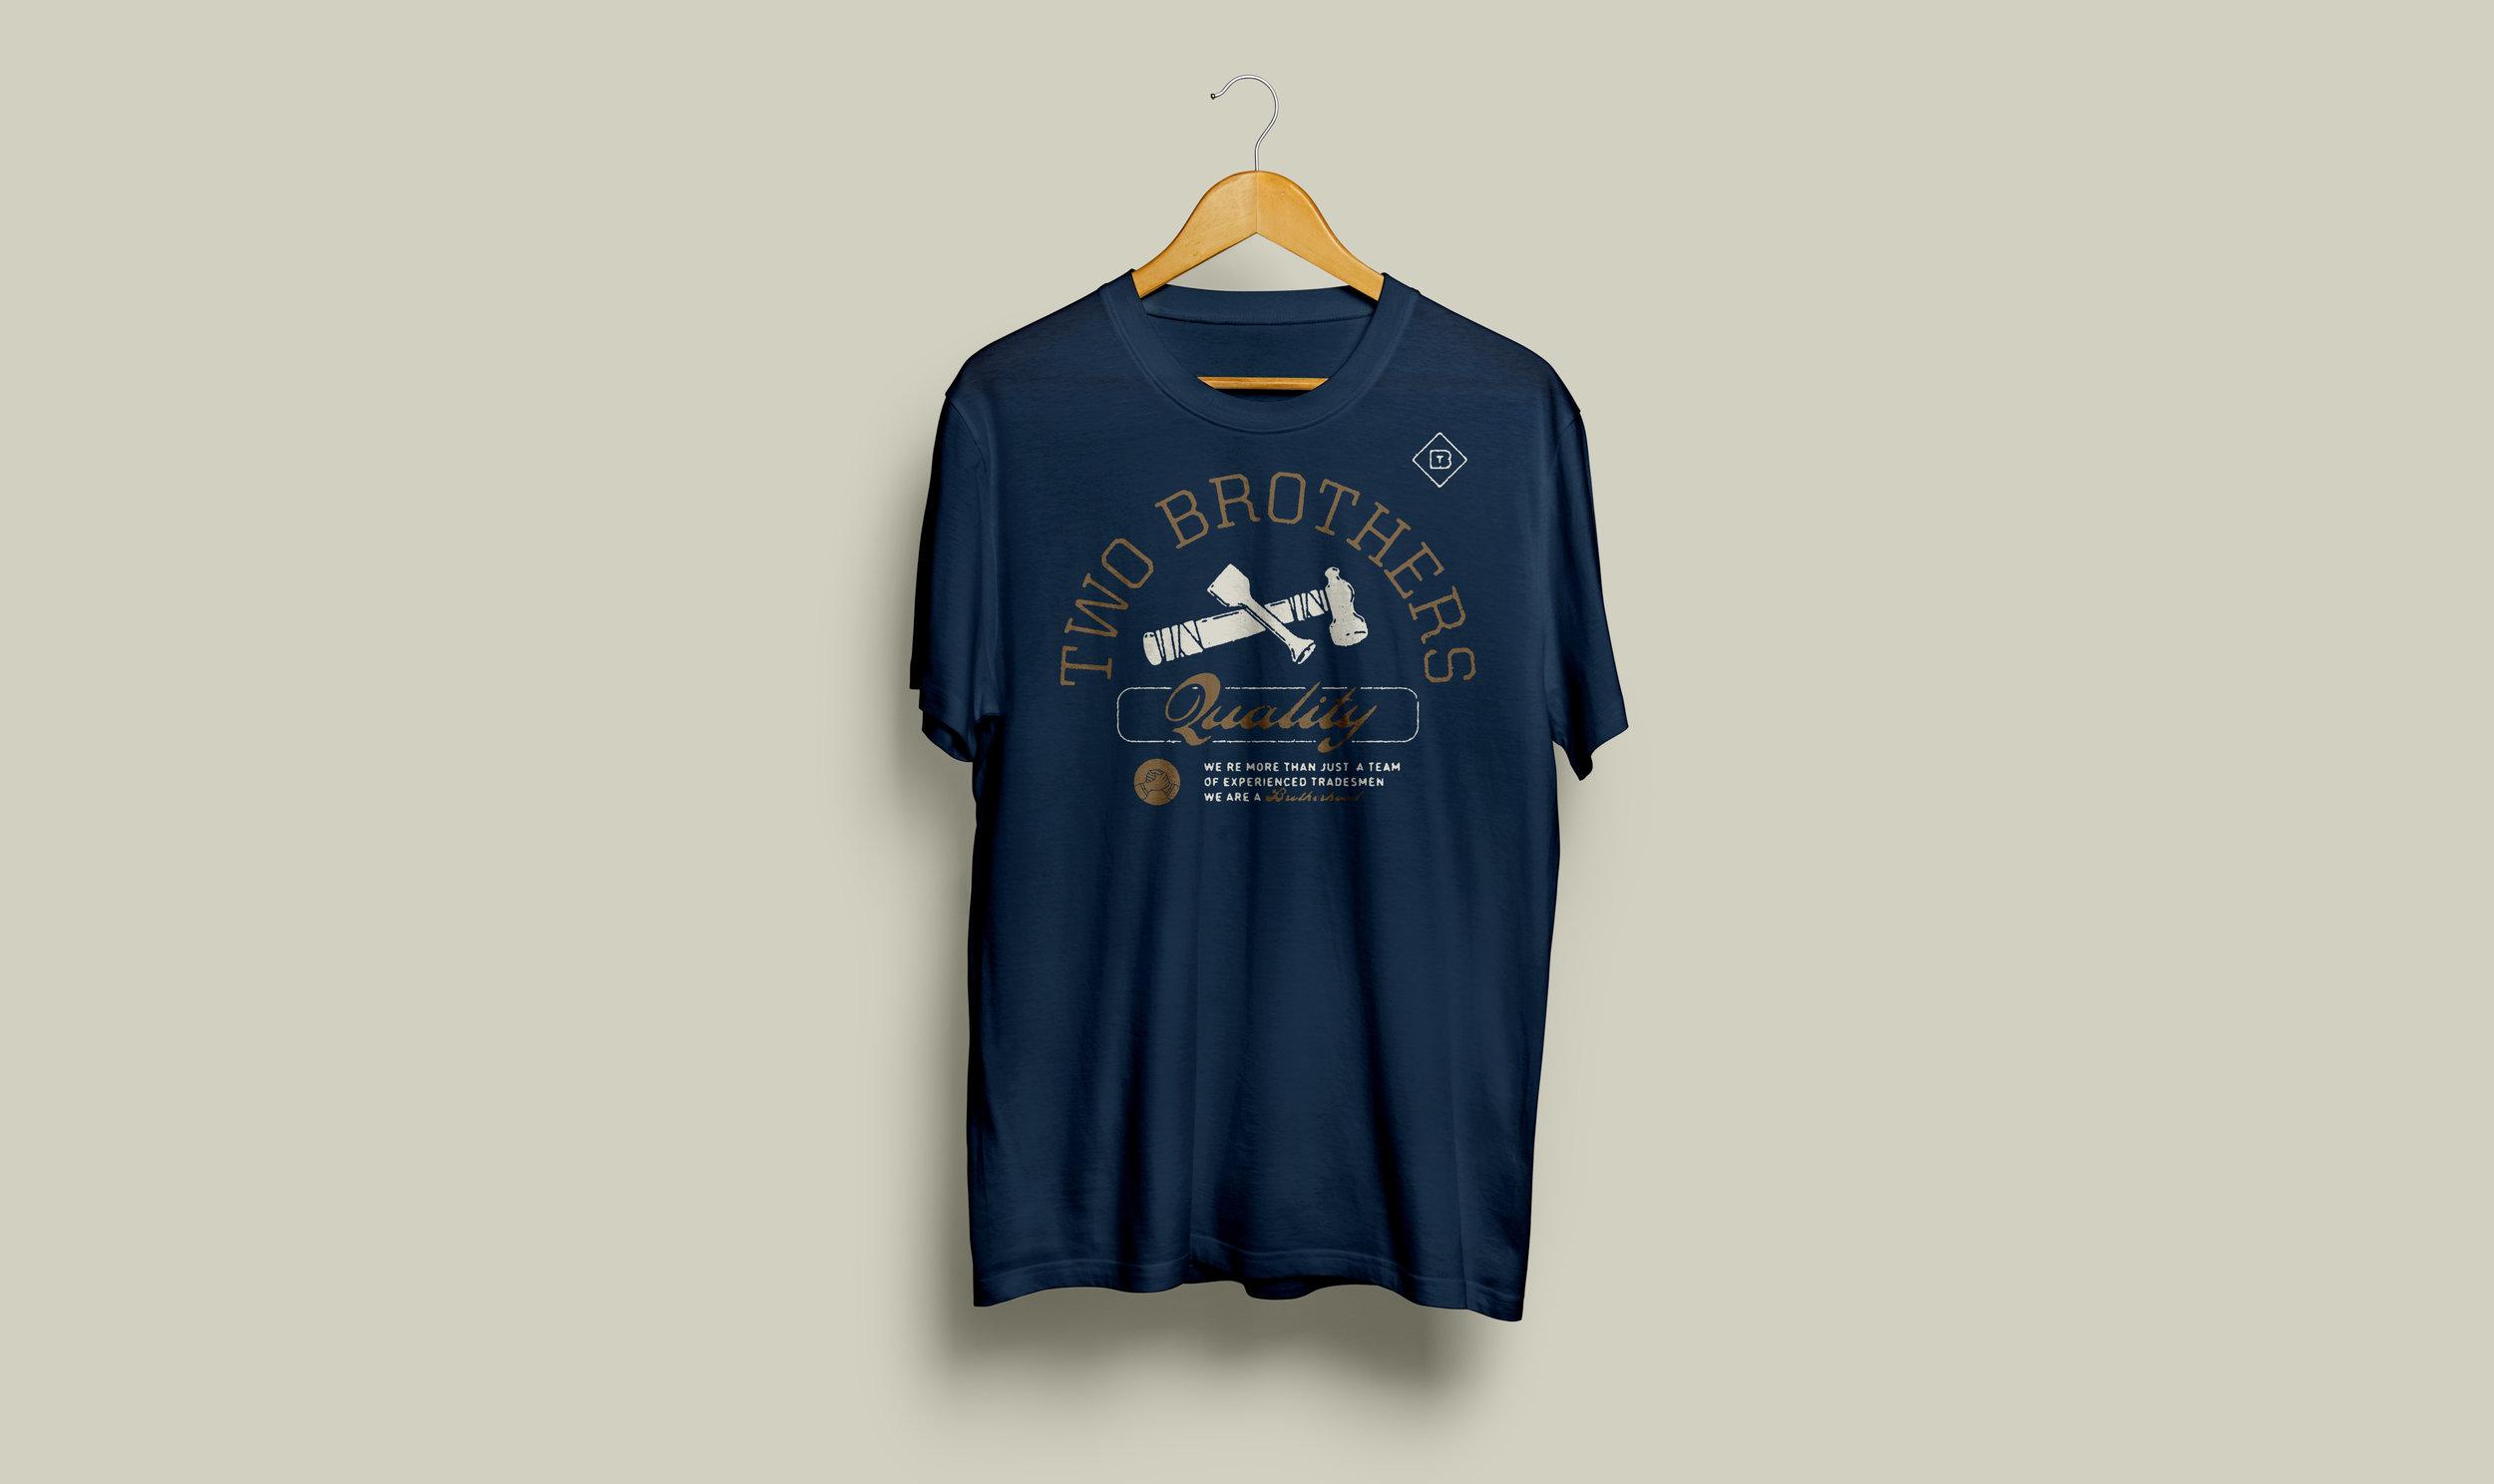 VS.Website.TwoBrothers.Tshirt.01a.jpg